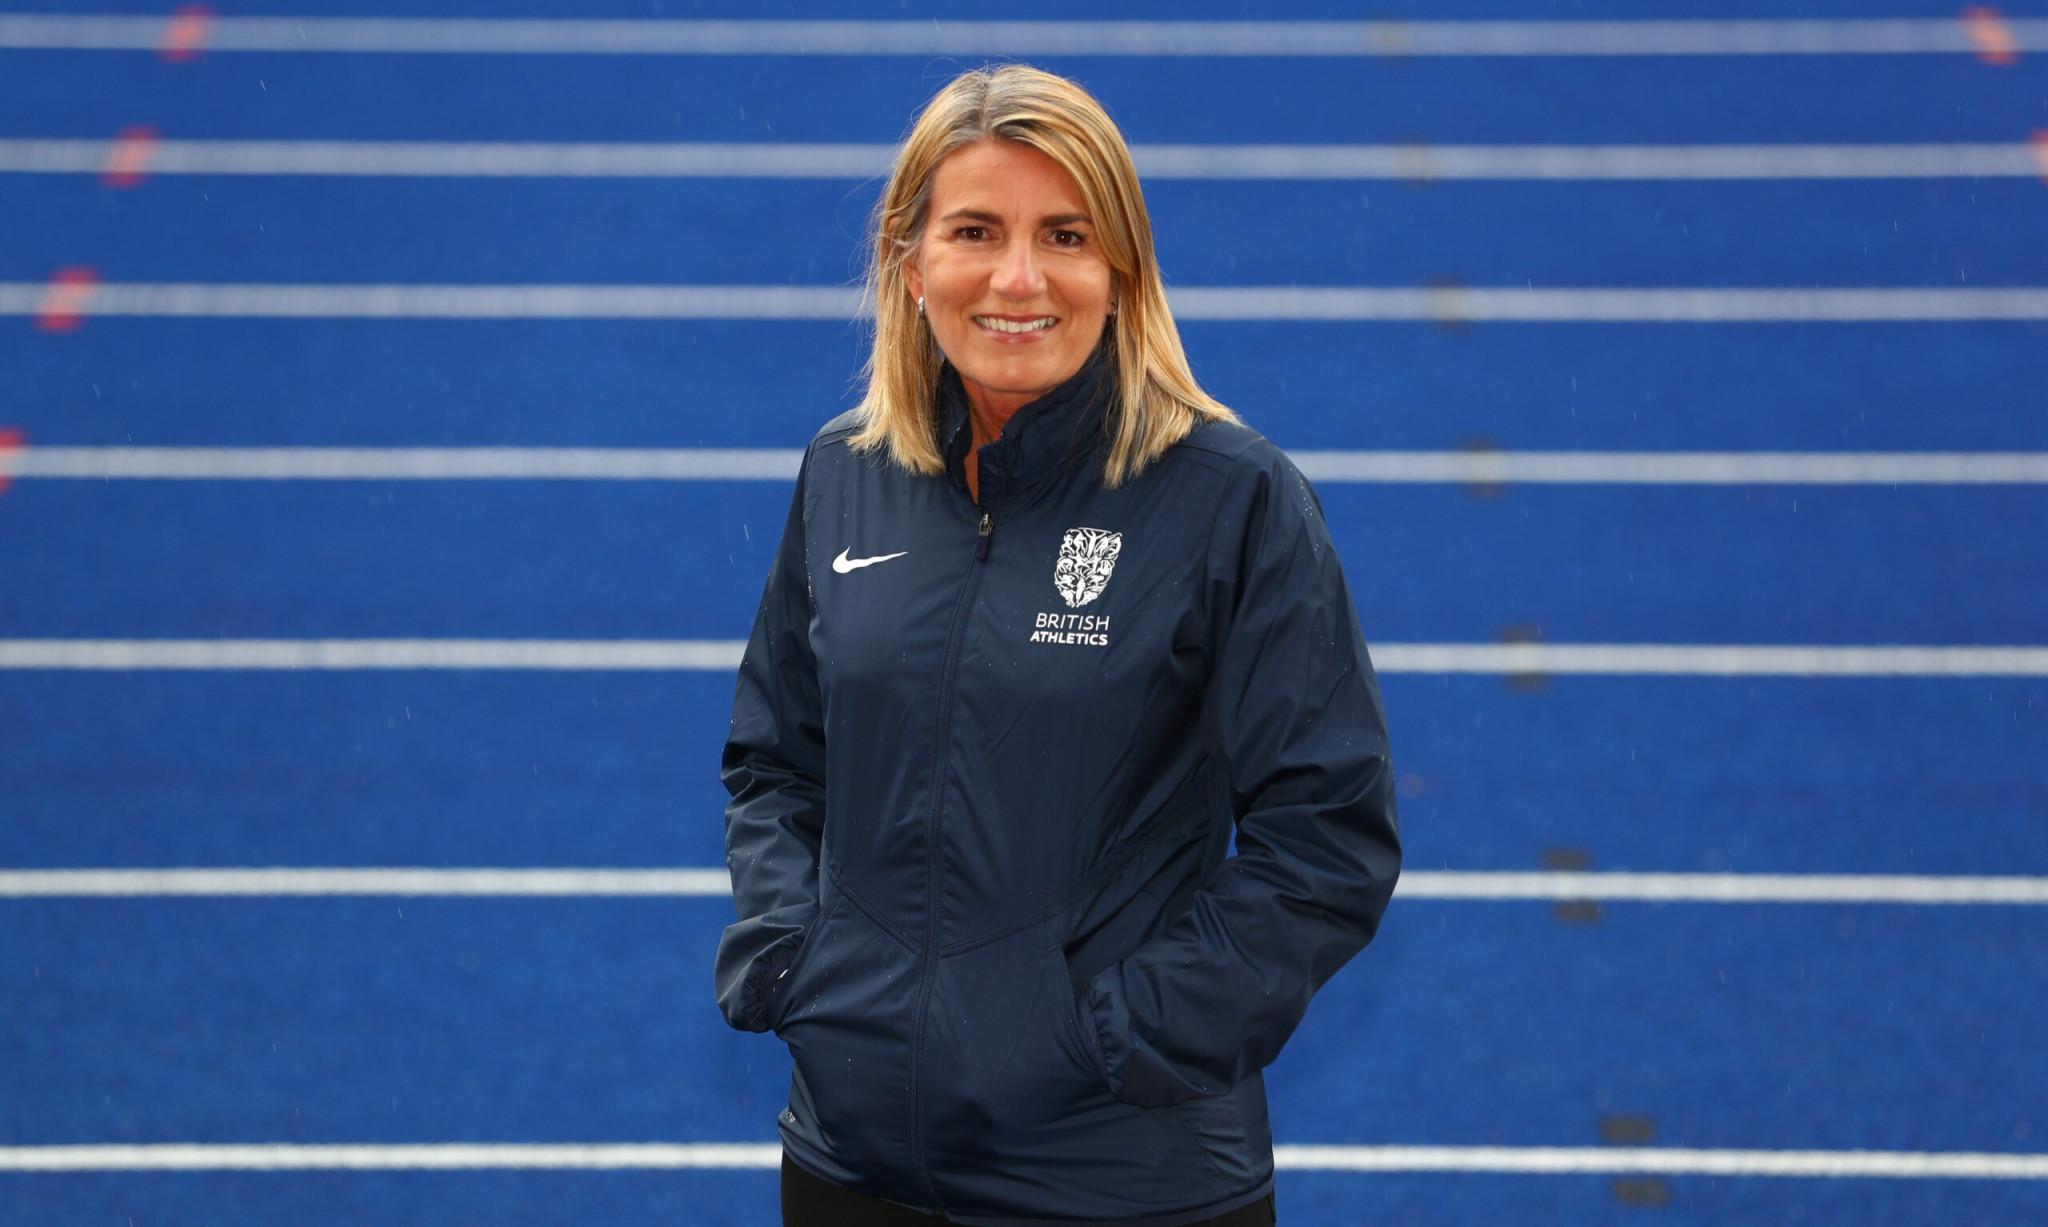 UK Athletics chief executive Joanna Coates claims the blueprint will improve how the sport is governed ©UK Athletics